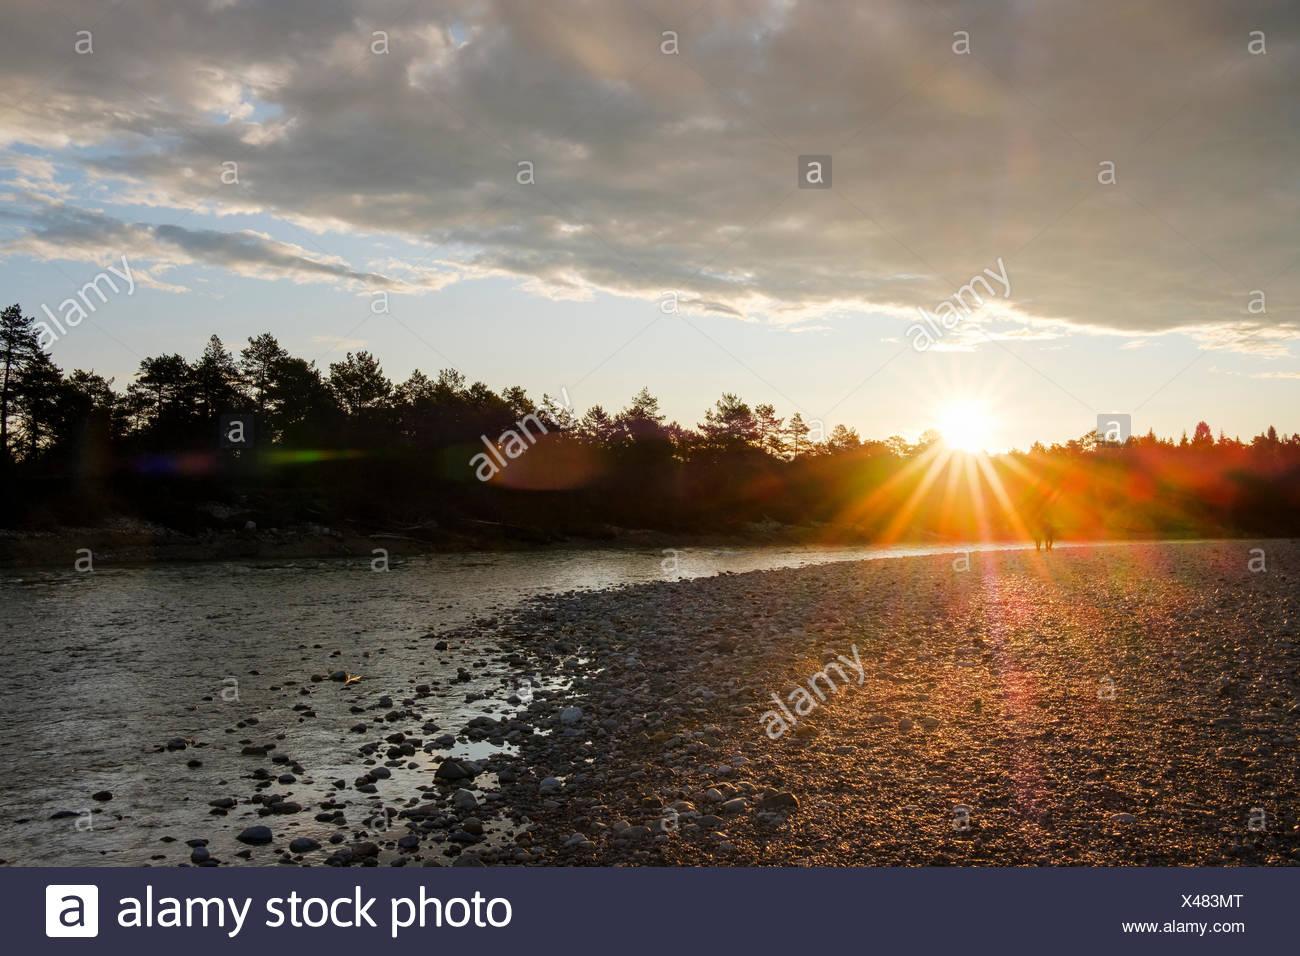 Sonnenuntergang, Isar bei Geretsried, Naturschutzgebiet Isarauen, Oberbayern, Bayern, Deutschland Stock Photo